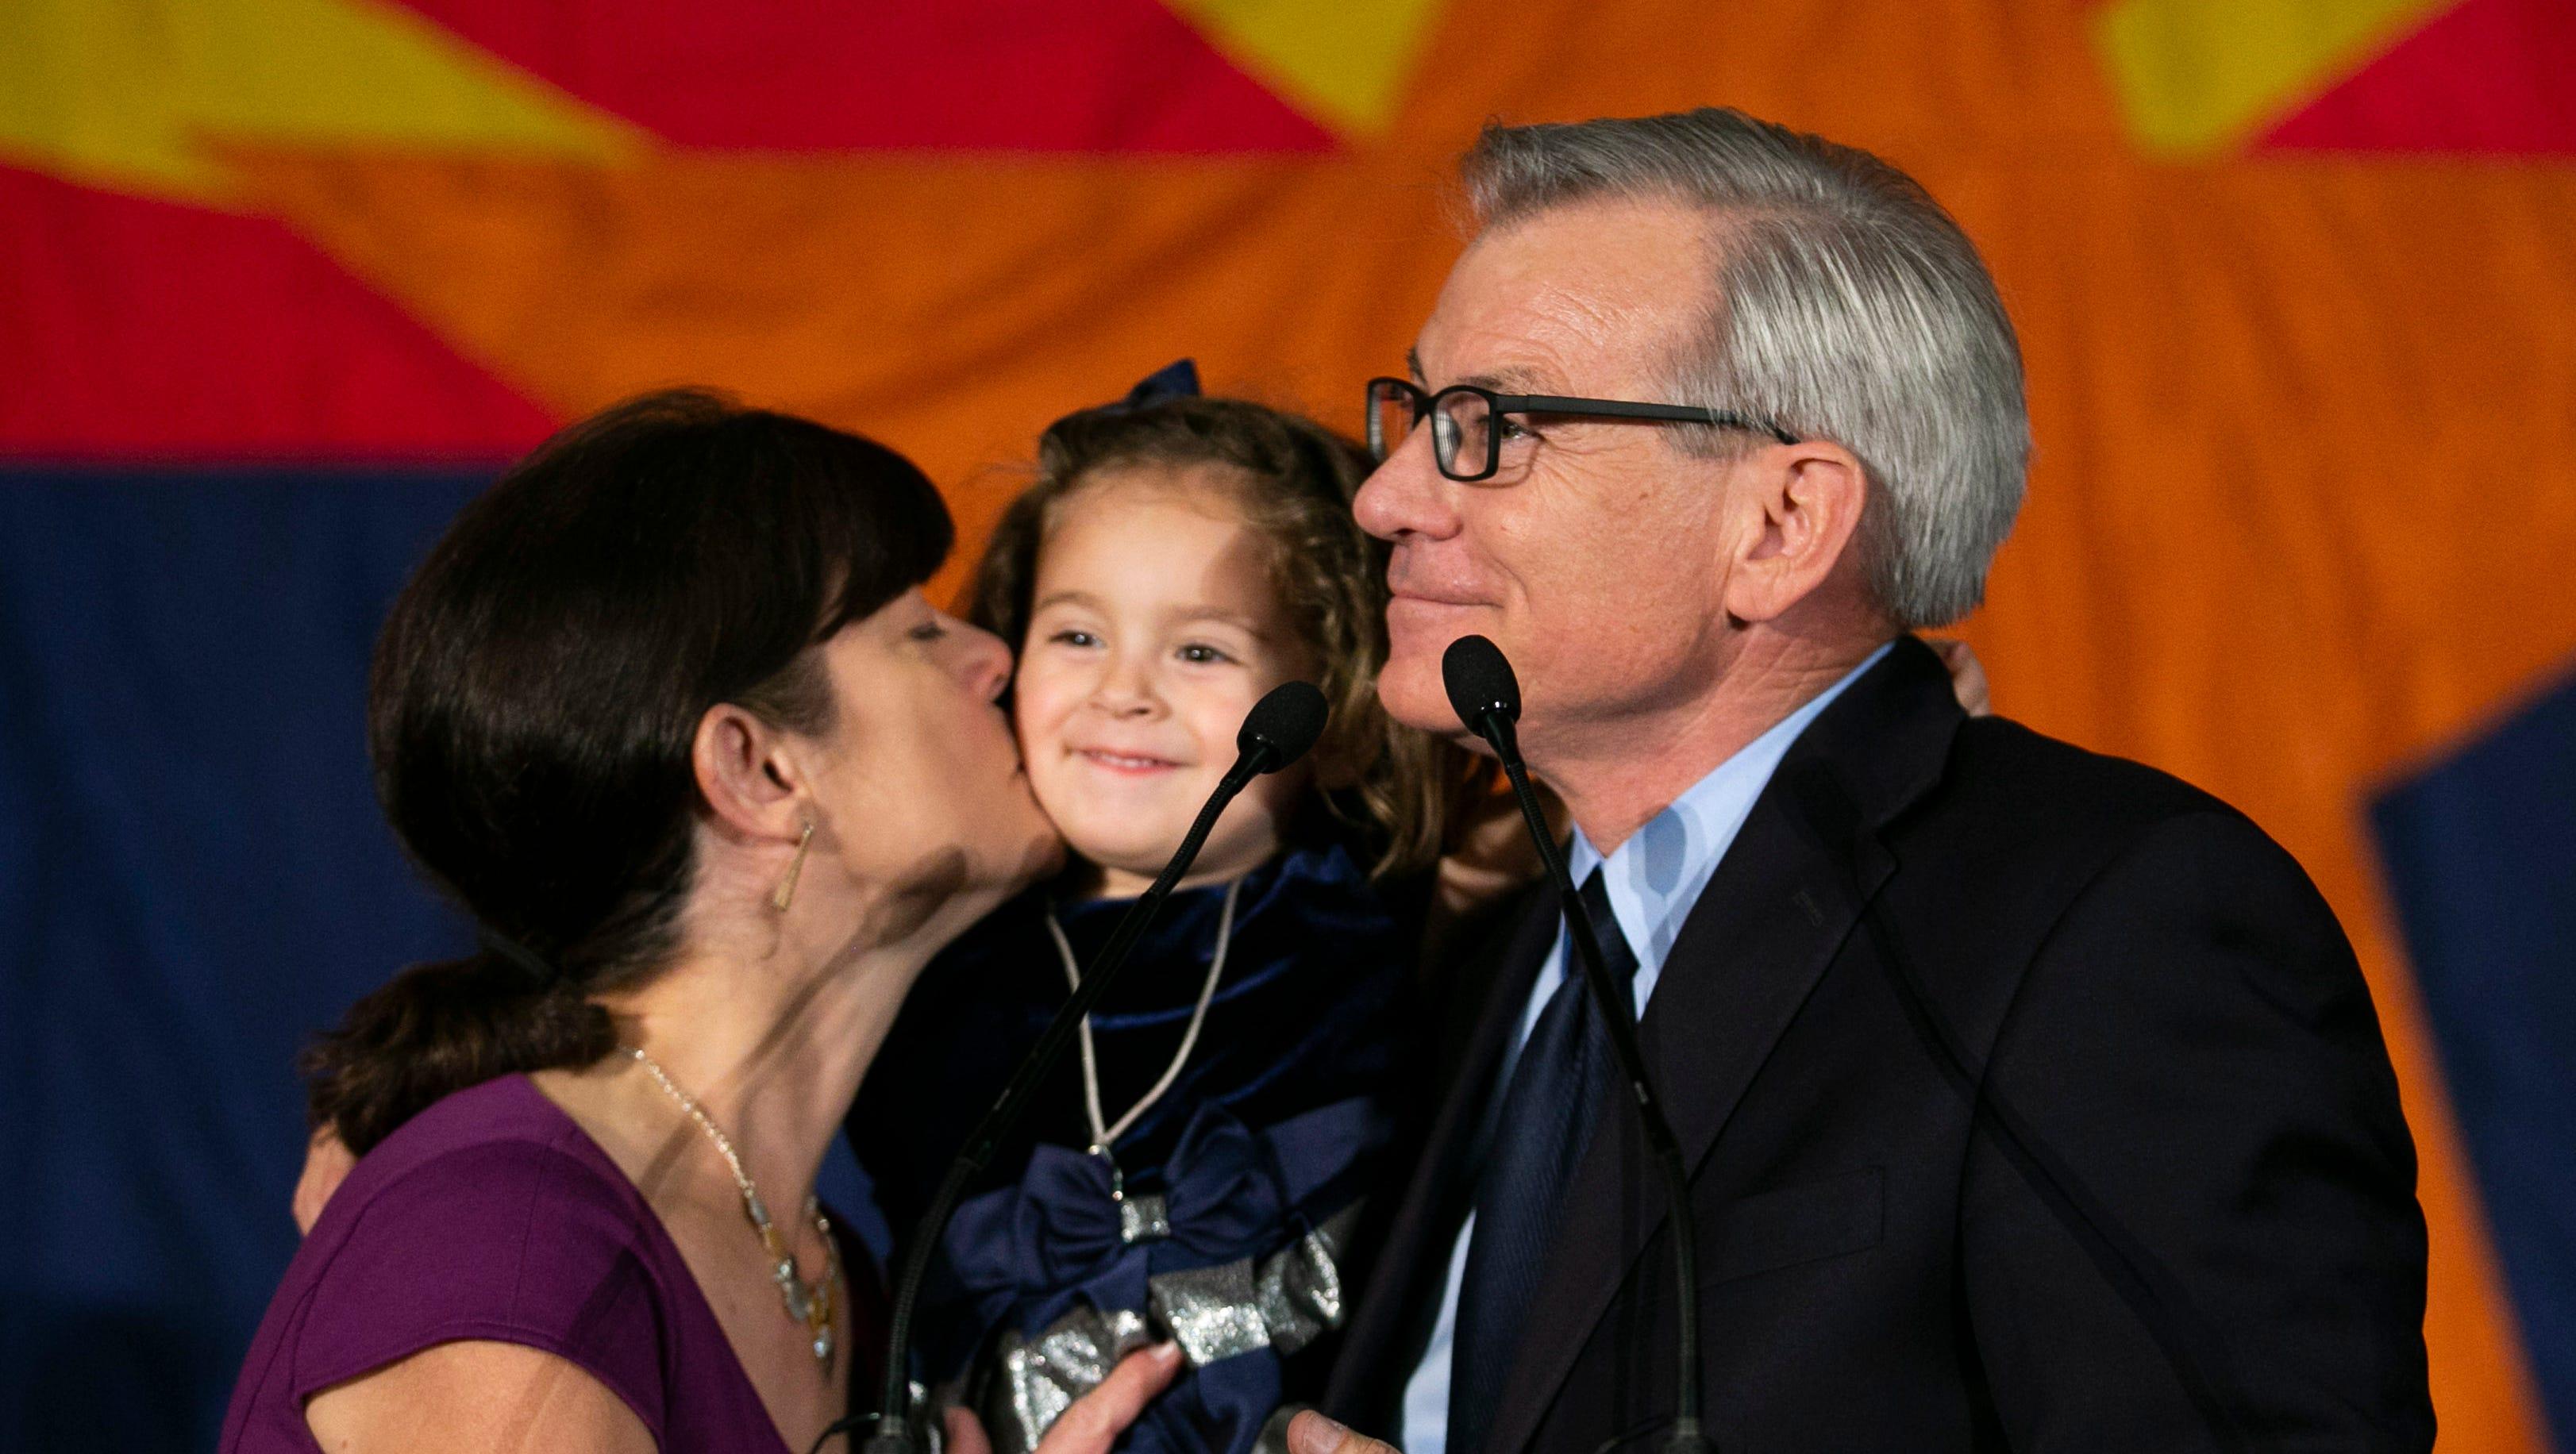 David Schweikert defeats Anita Malik in Arizona's Congressional District 6 race